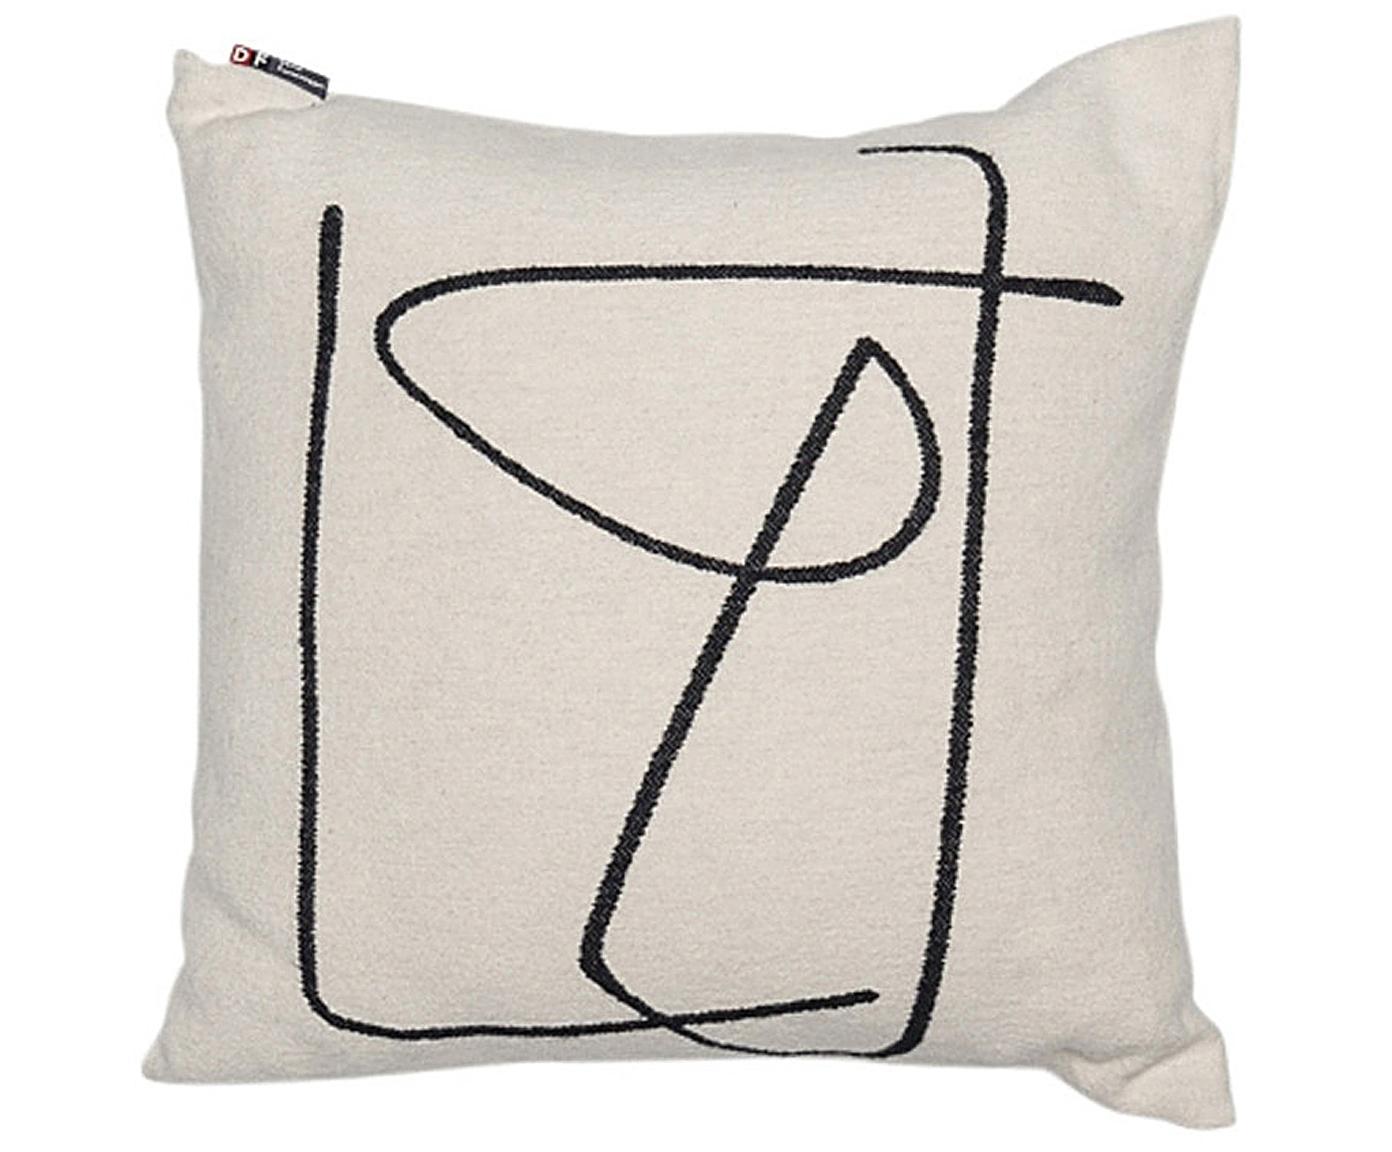 Funda de cojín Nova, Tapizado: 85%algodón, 8%viscosa, , Blanco, negro, An 50 x L 50 cm